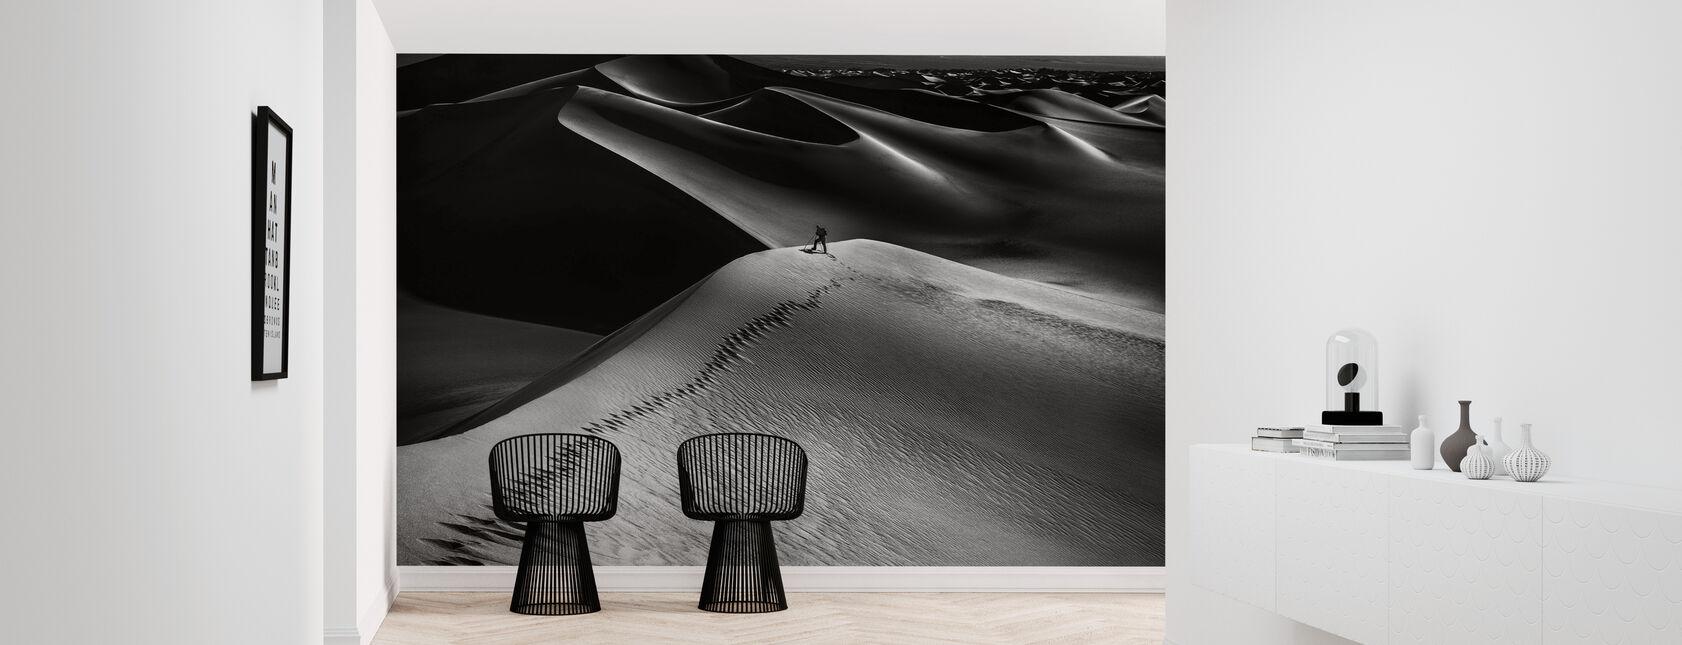 One Set of Footprints - Wallpaper - Hallway